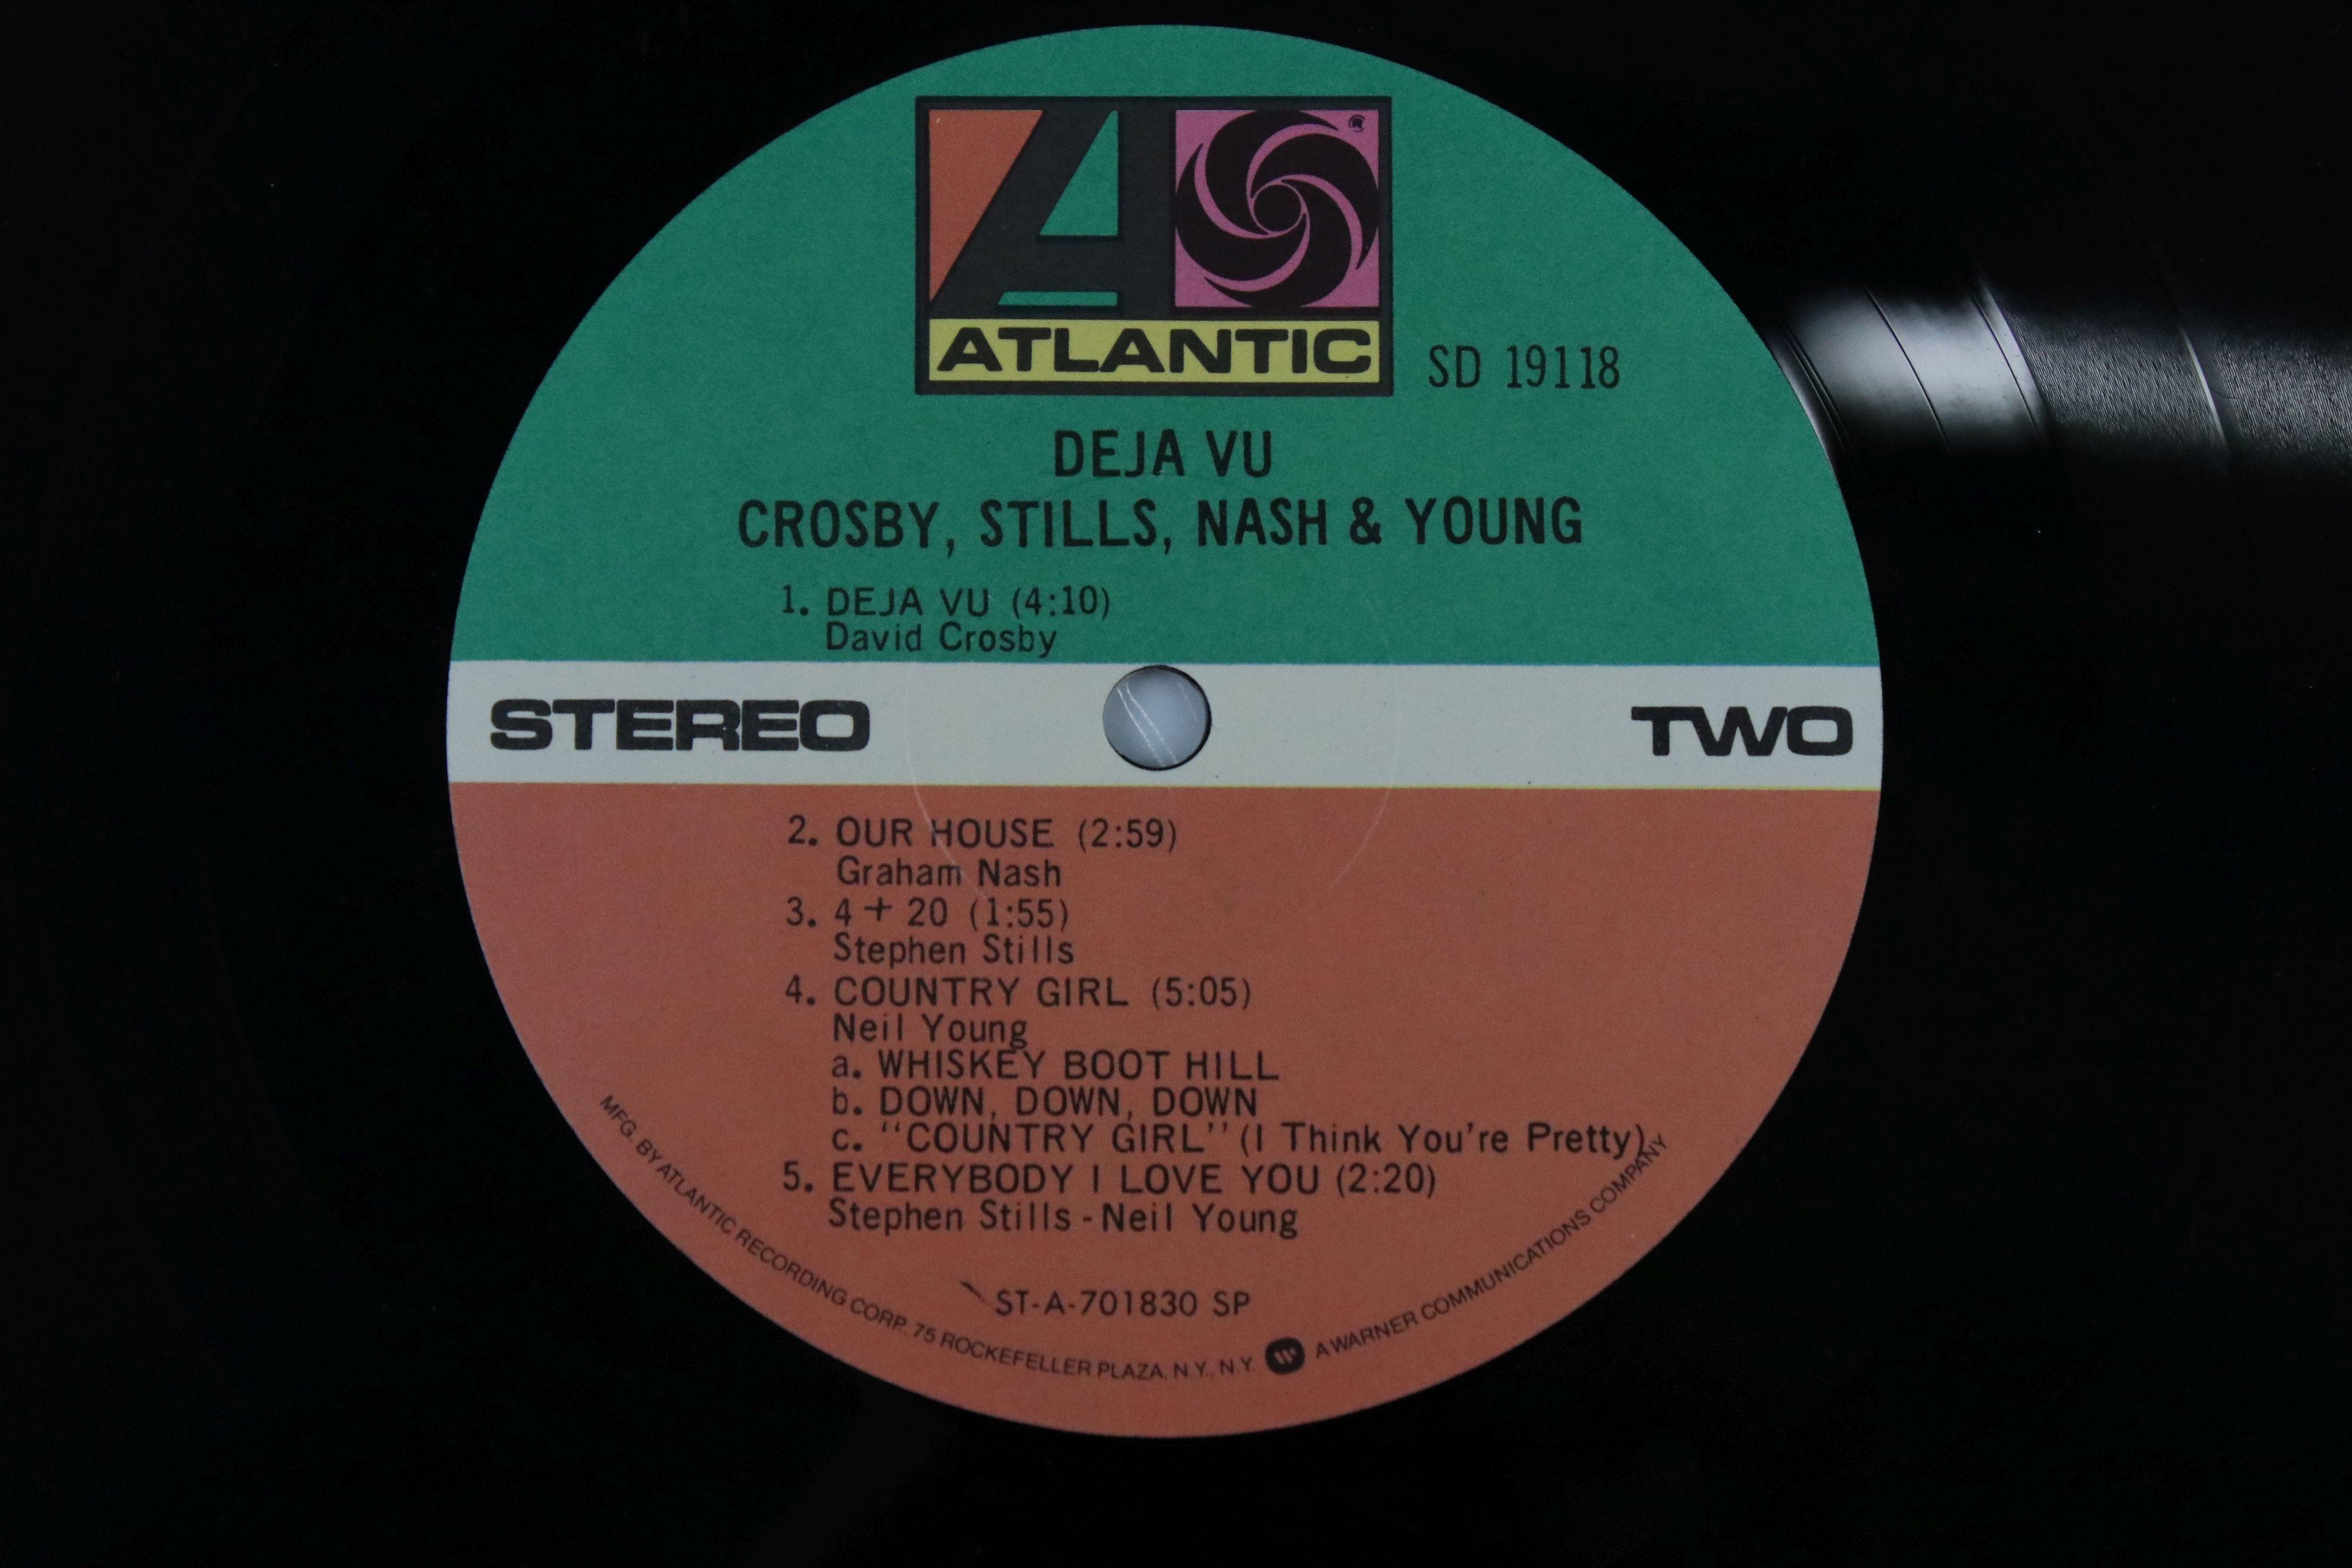 Signed Vinyl - Crosby Stills Nash & Young Deja Vu LP US pressing on Atlantic SD19118, signed by - Image 4 of 4